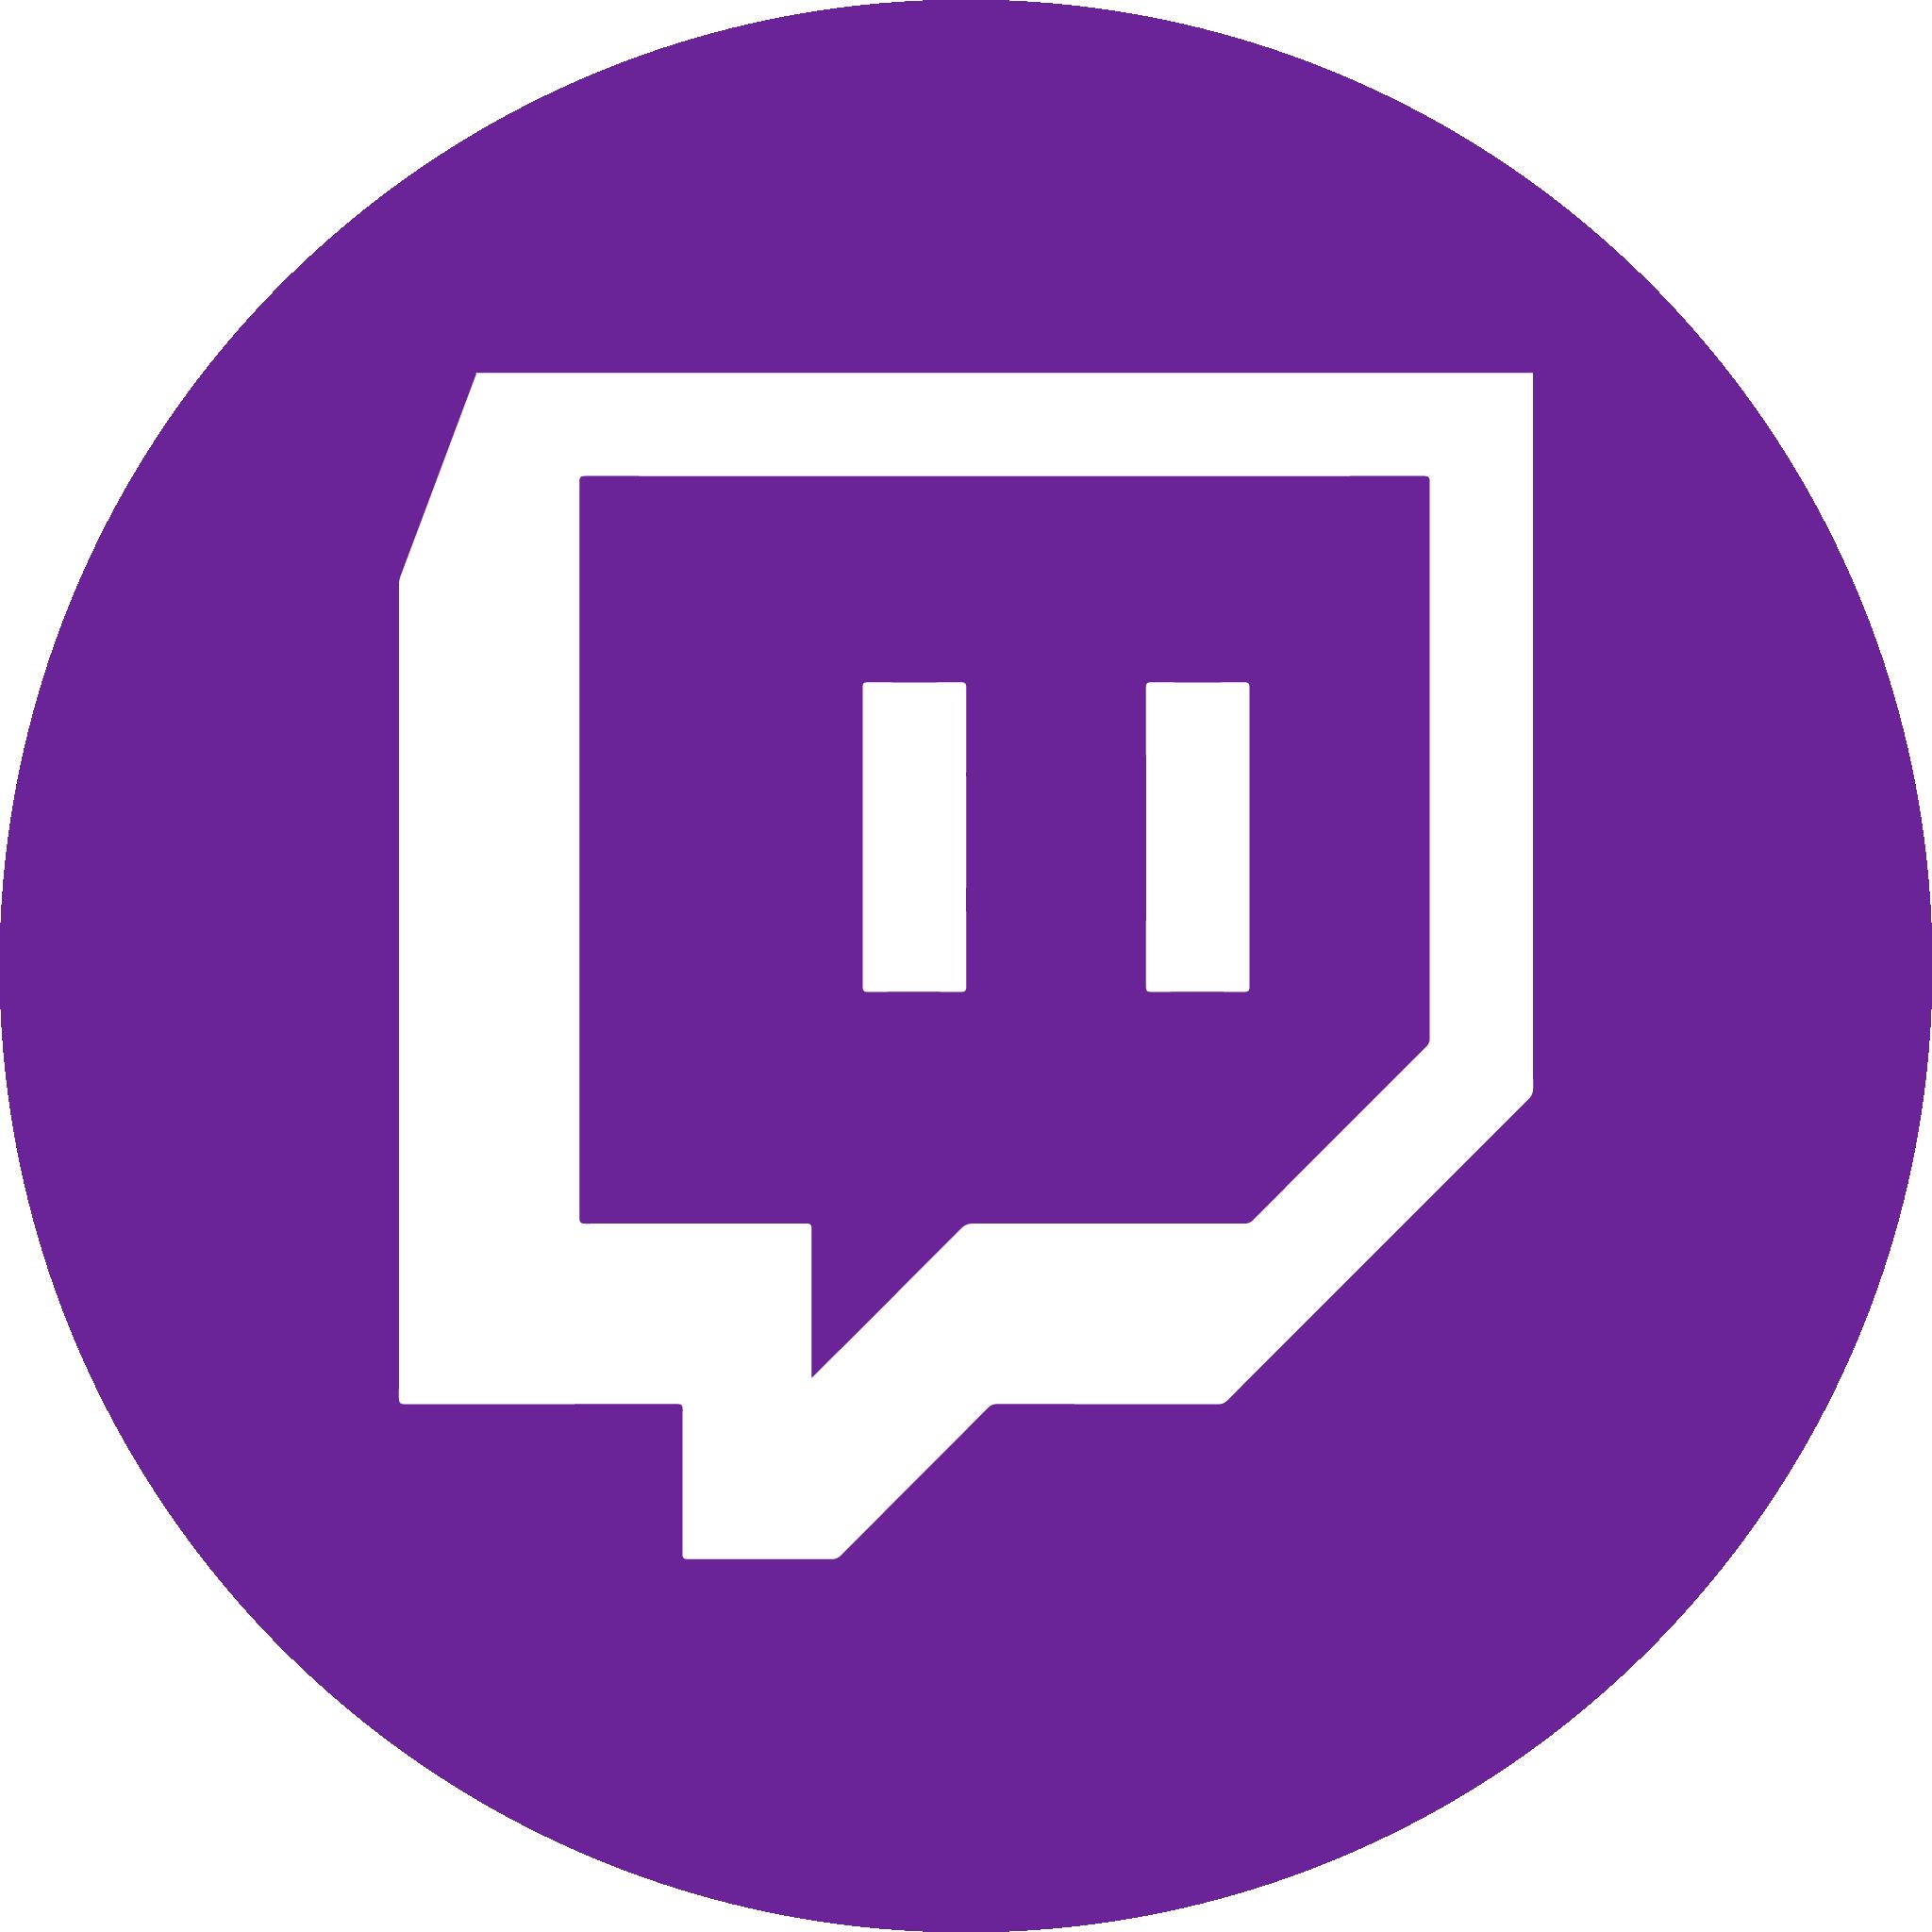 purple twitch logo png #1873